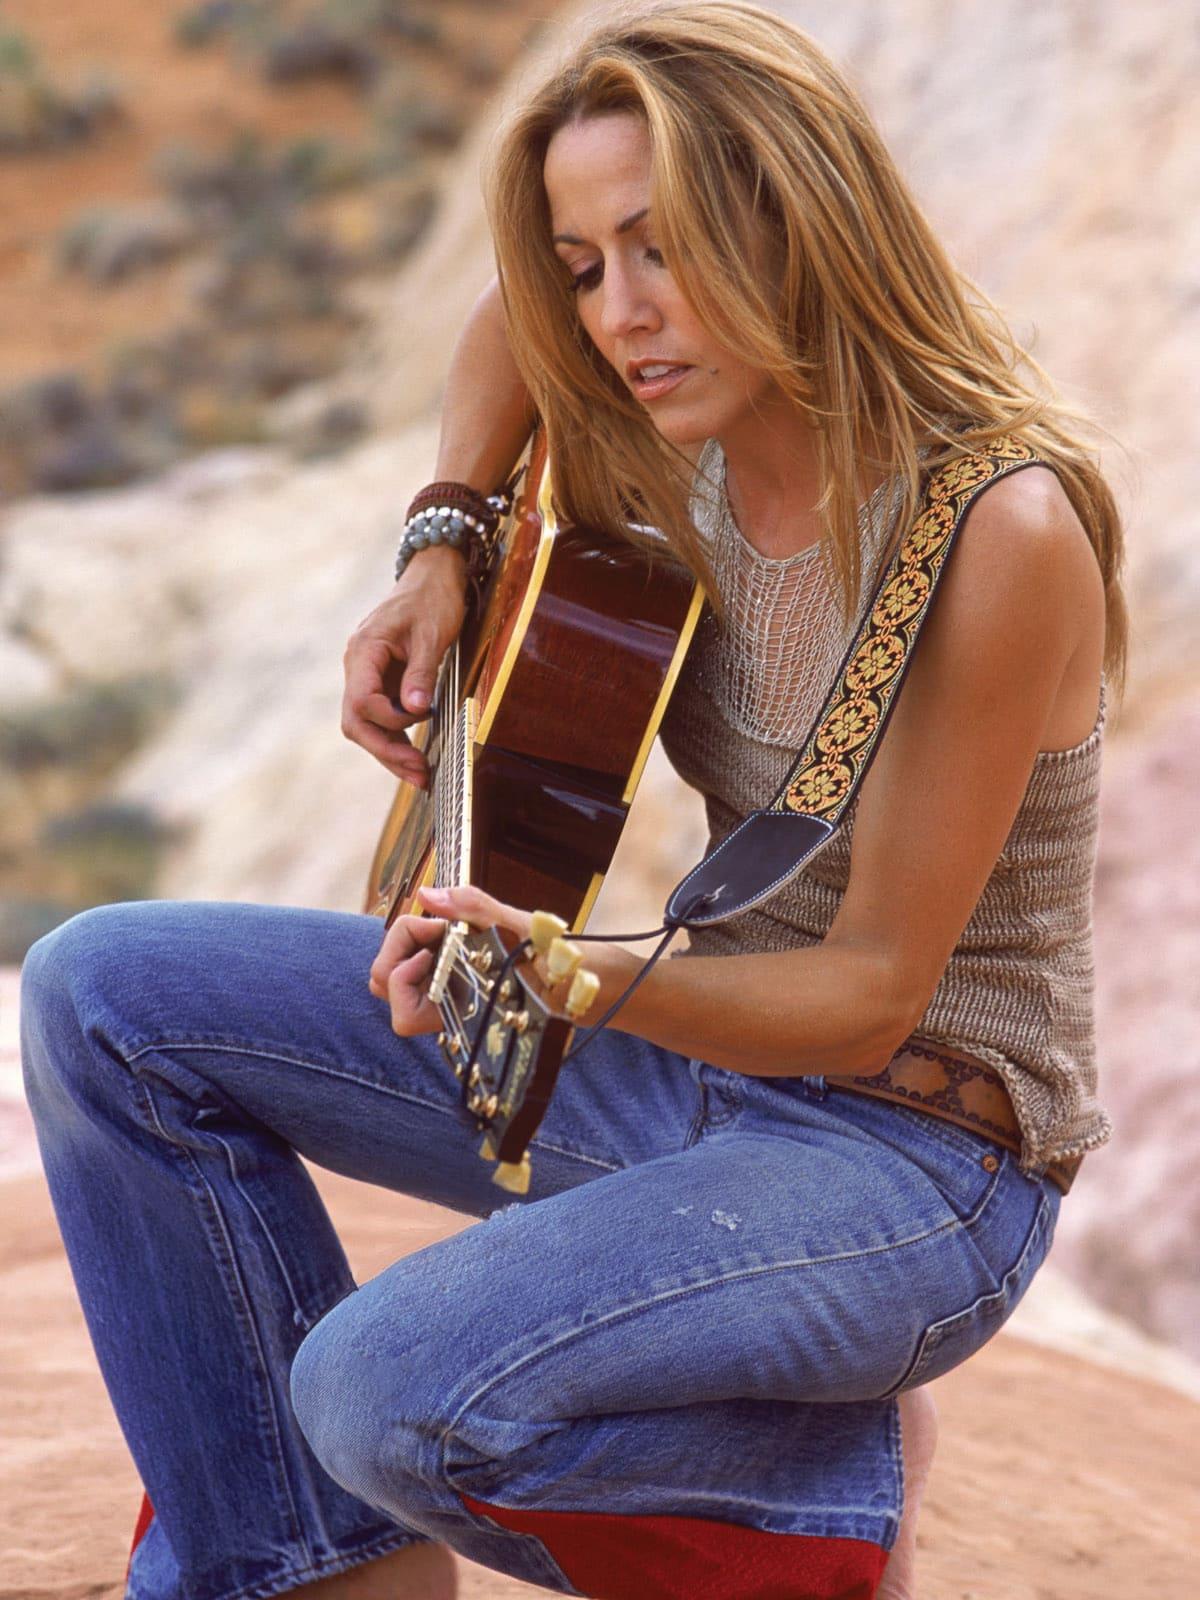 News_Michael D. Clark_concert pick_Sheryl Crow